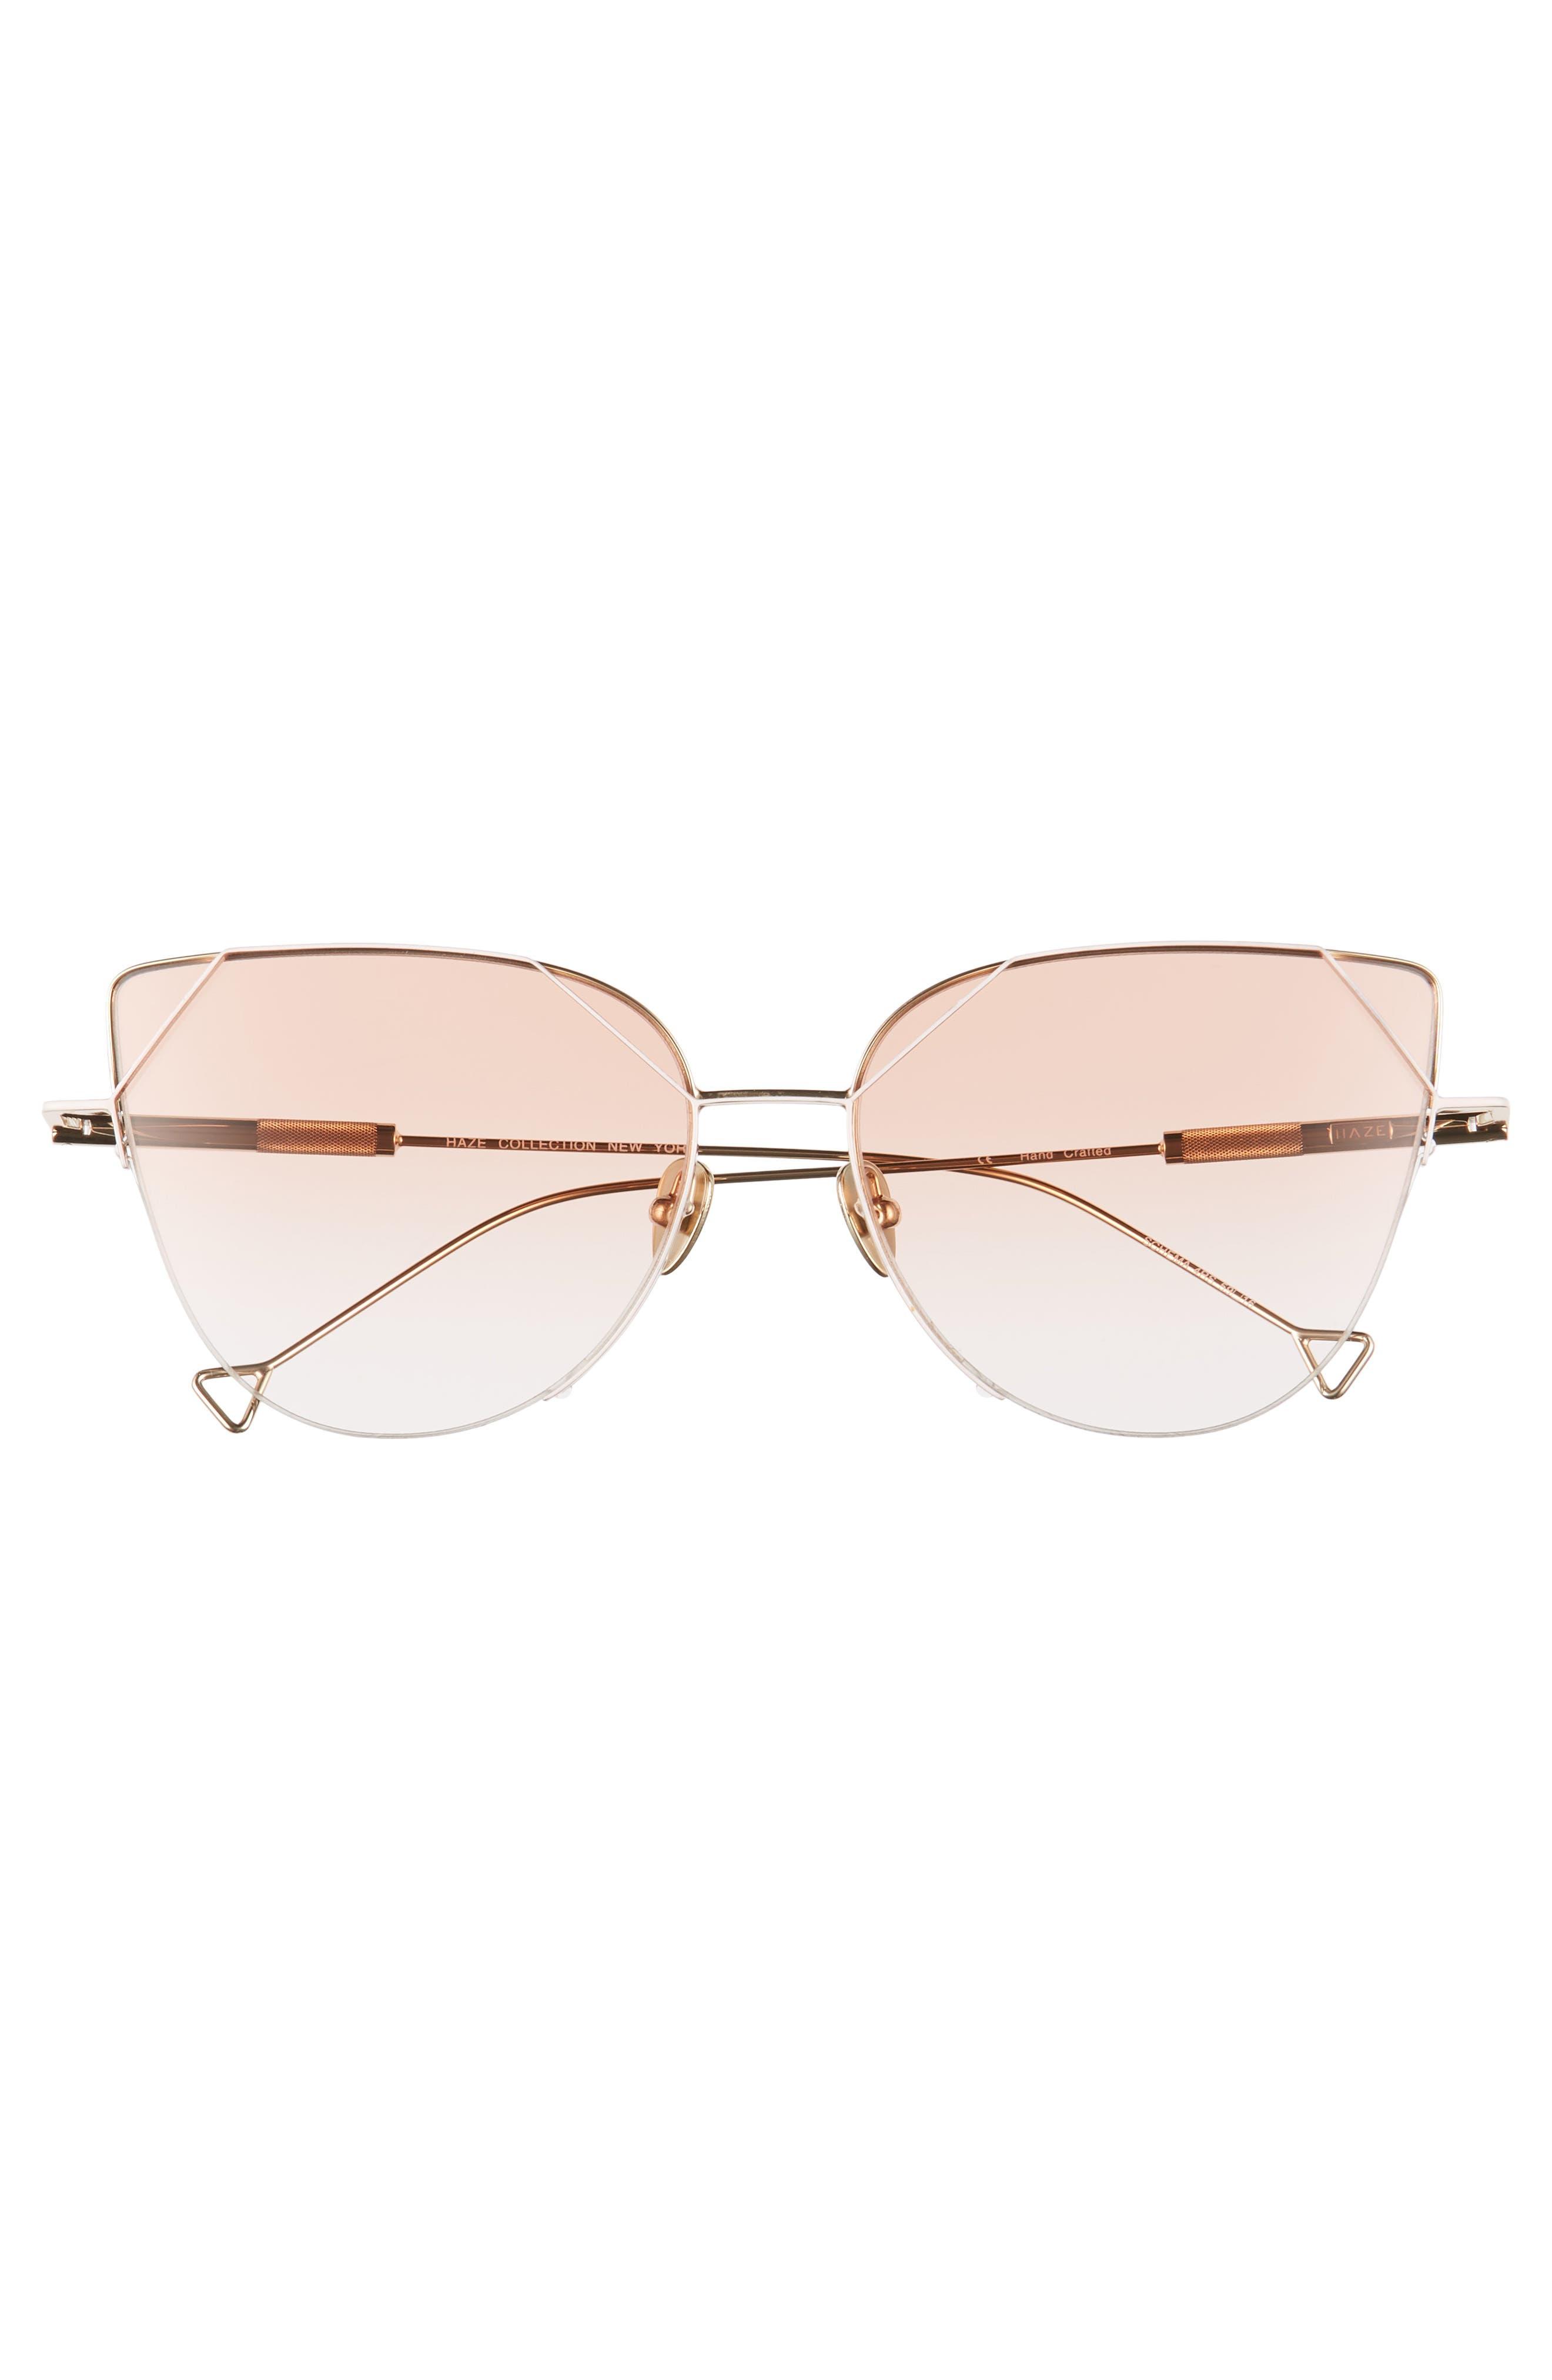 HAZE, The Schema 59mm Cat Eye Sunglasses, Alternate thumbnail 3, color, NUDE